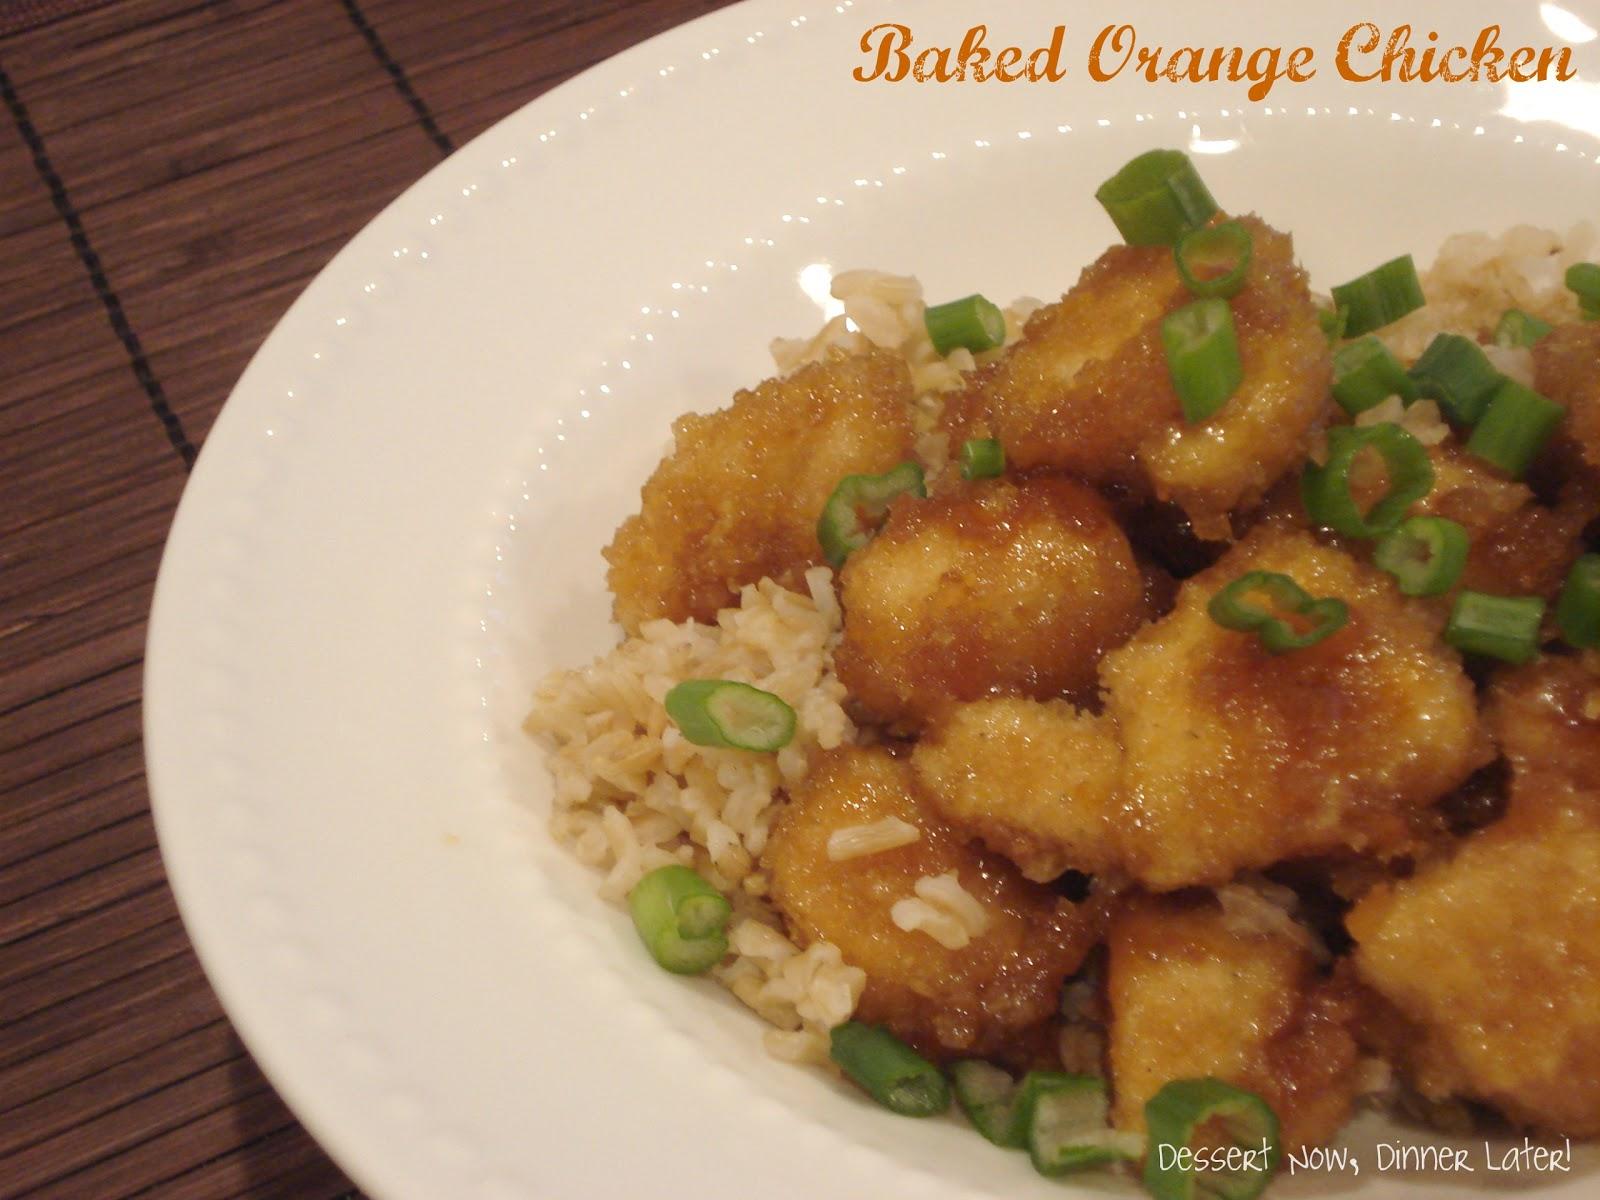 Baked Orange Chicken - Dessert Now, Dinner Later!